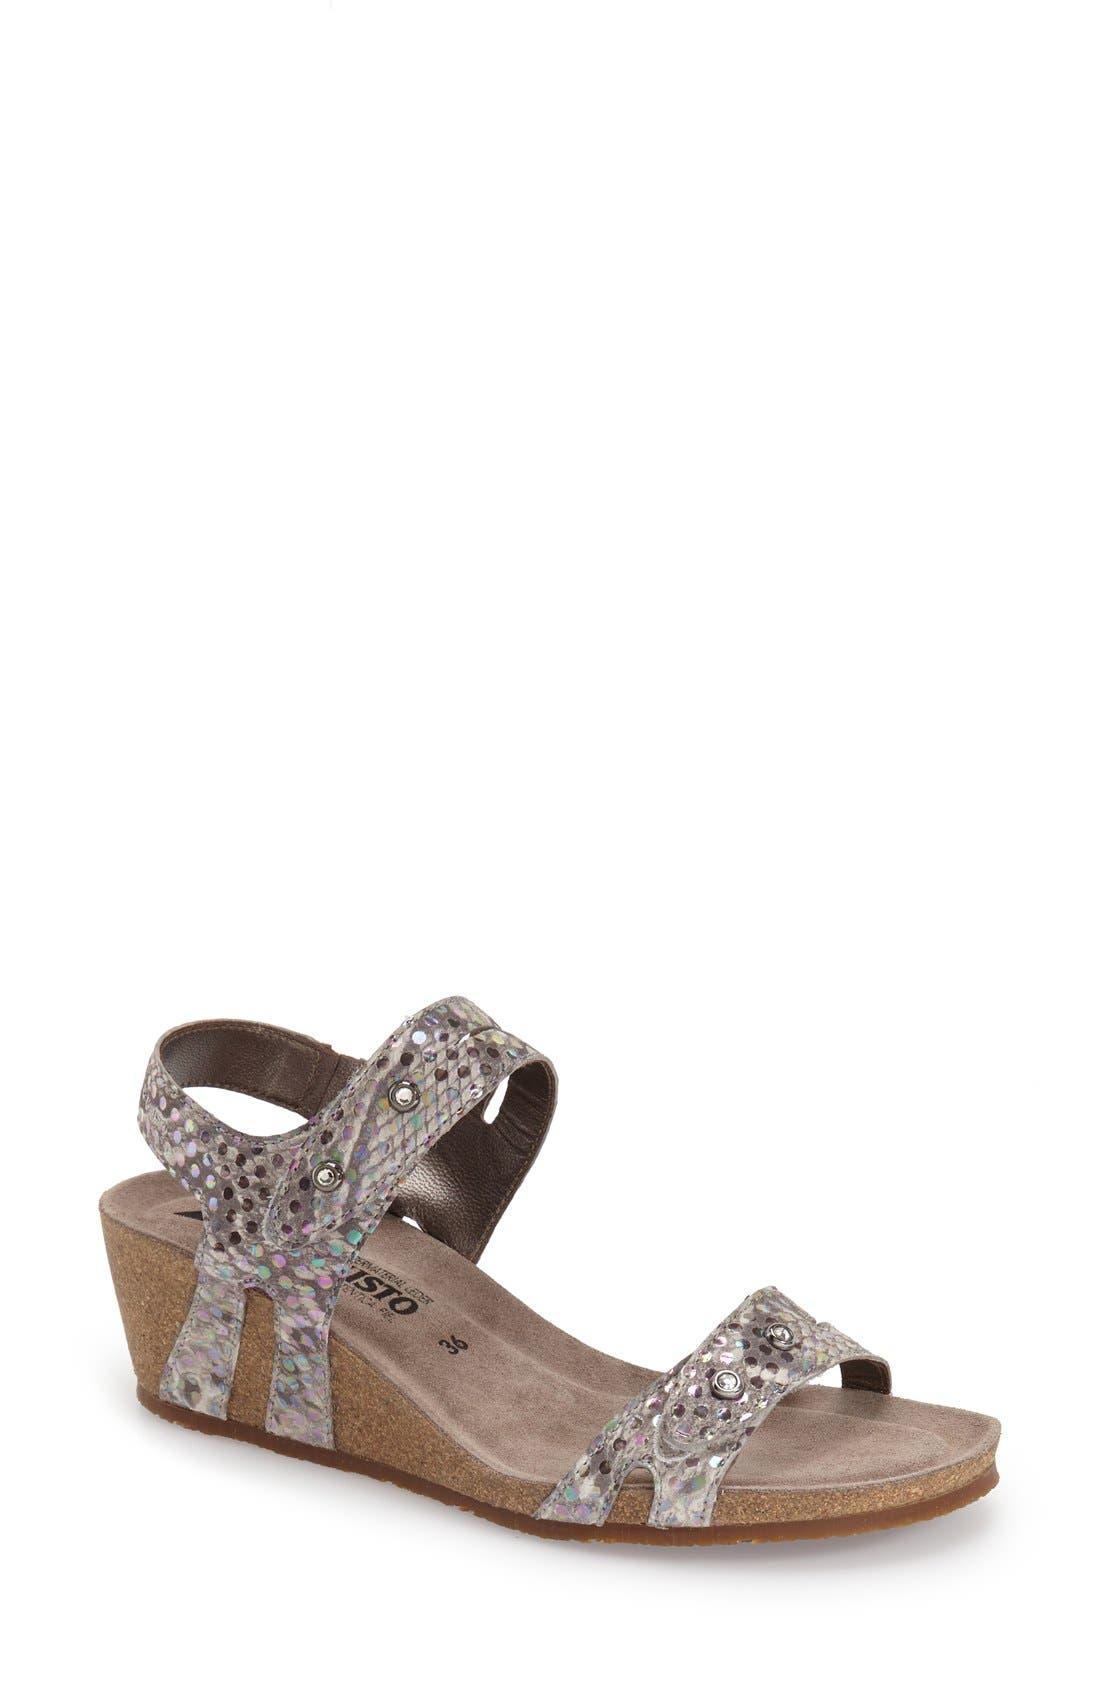 MEPHISTO 'Minoa' Wedge Sandal, Main, color, LIGHT GREY MIMOSA